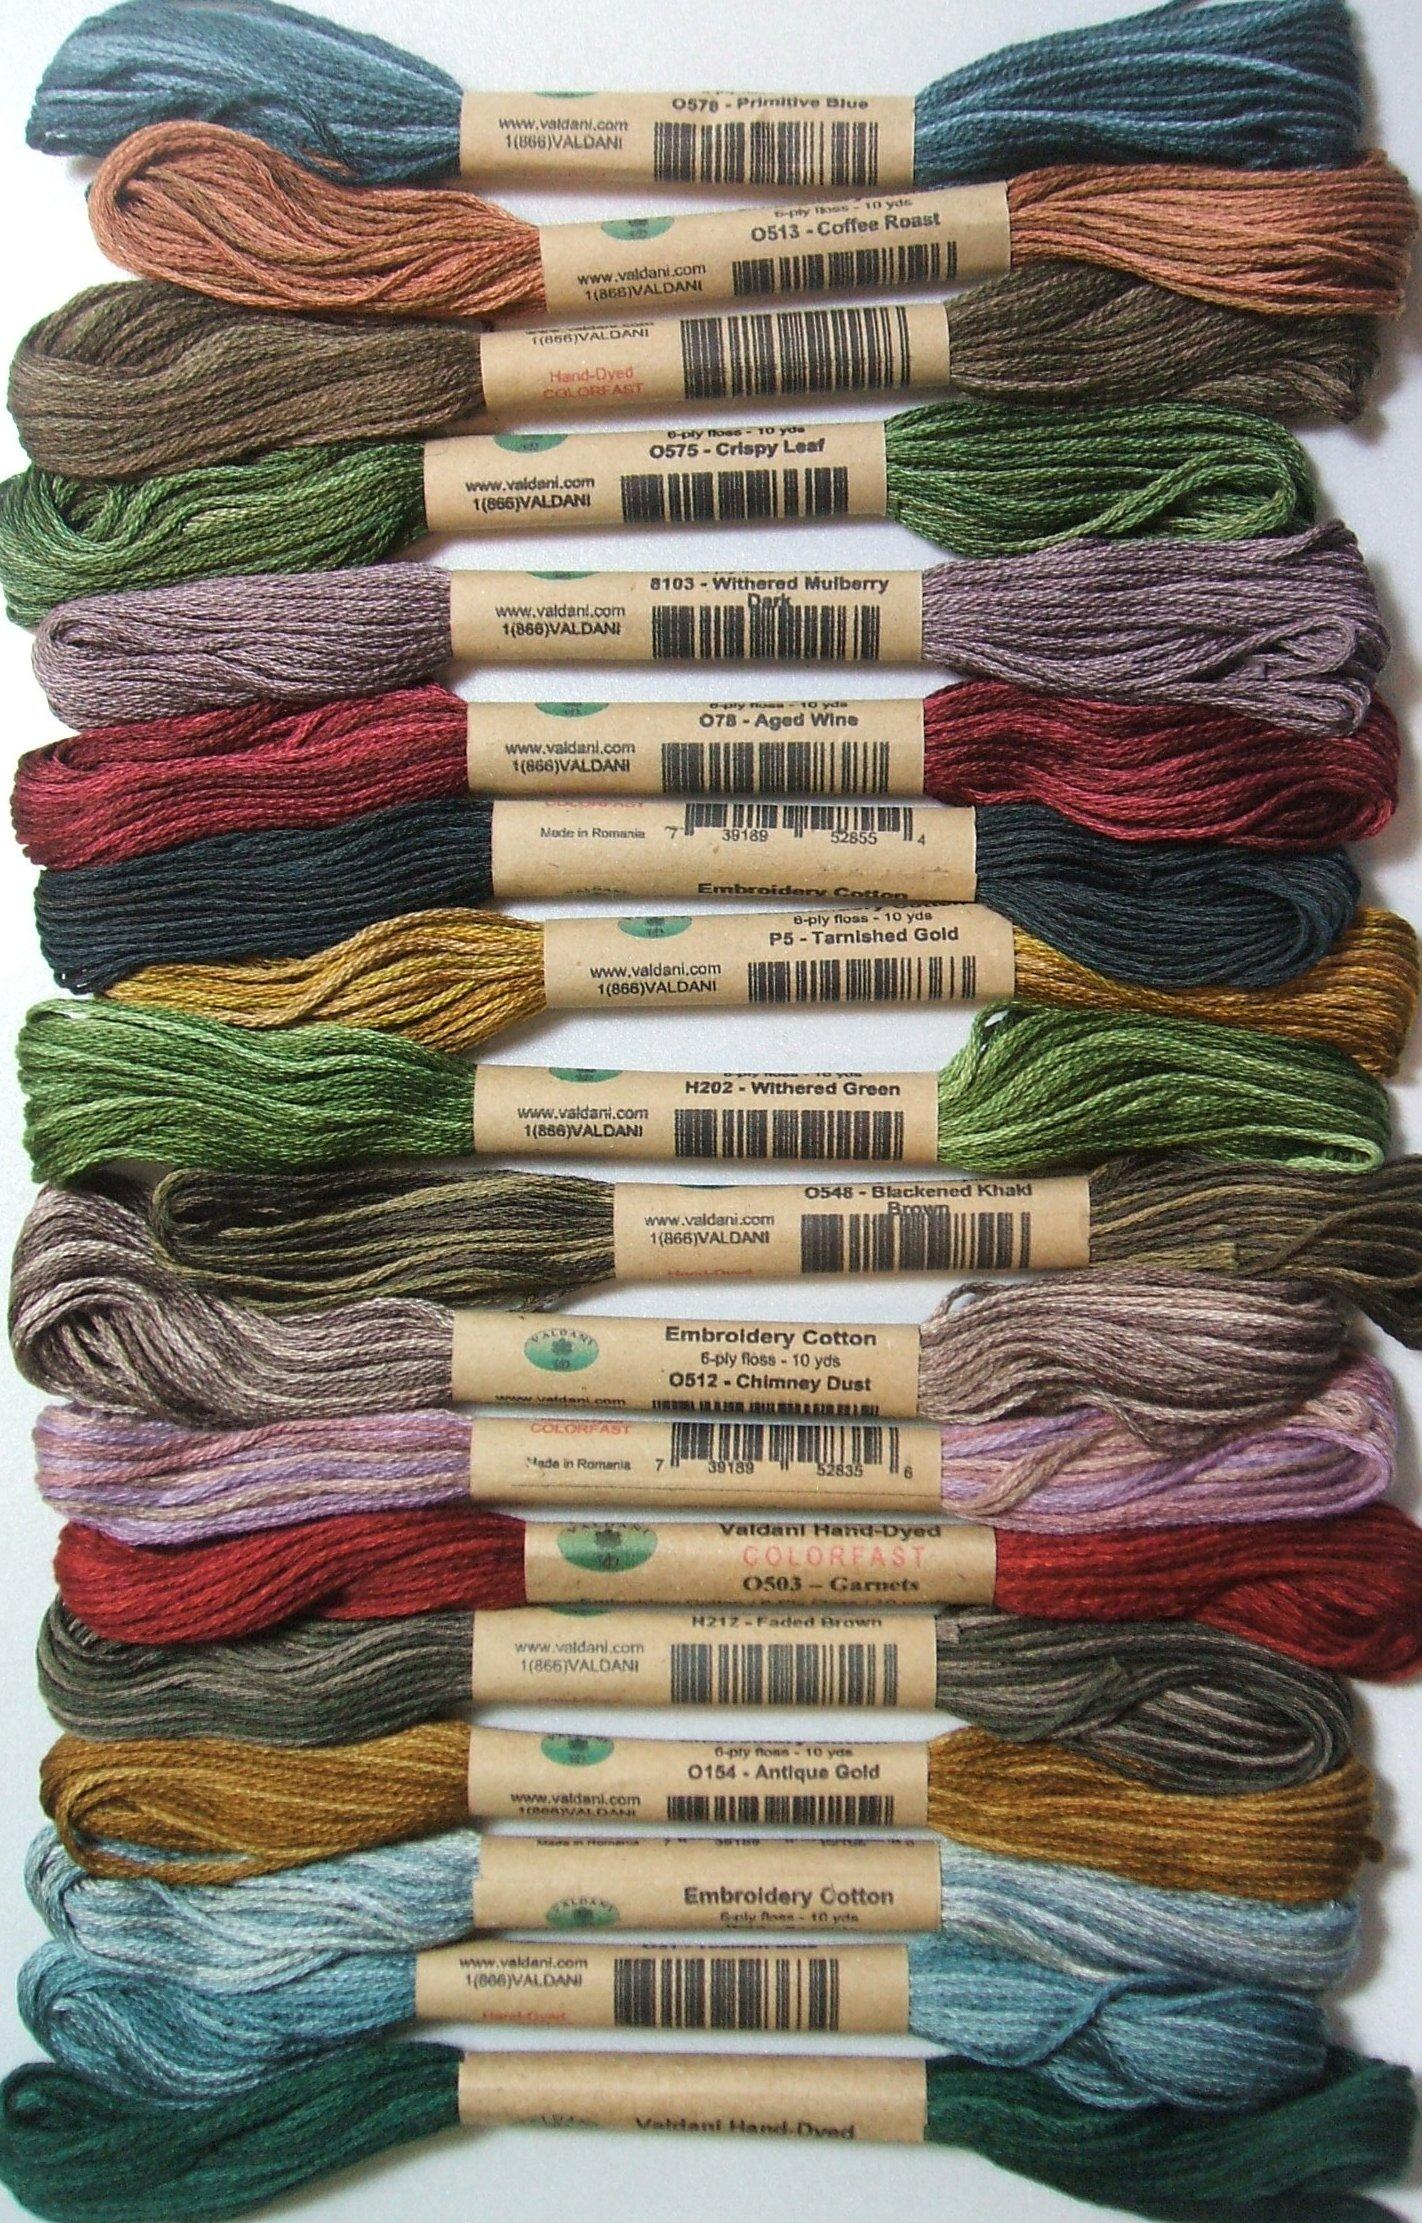 18 Valdani 6 Ply Strand Floss Embroidery Thread Anderson's Farm 10 Yard Skeins by Valdani